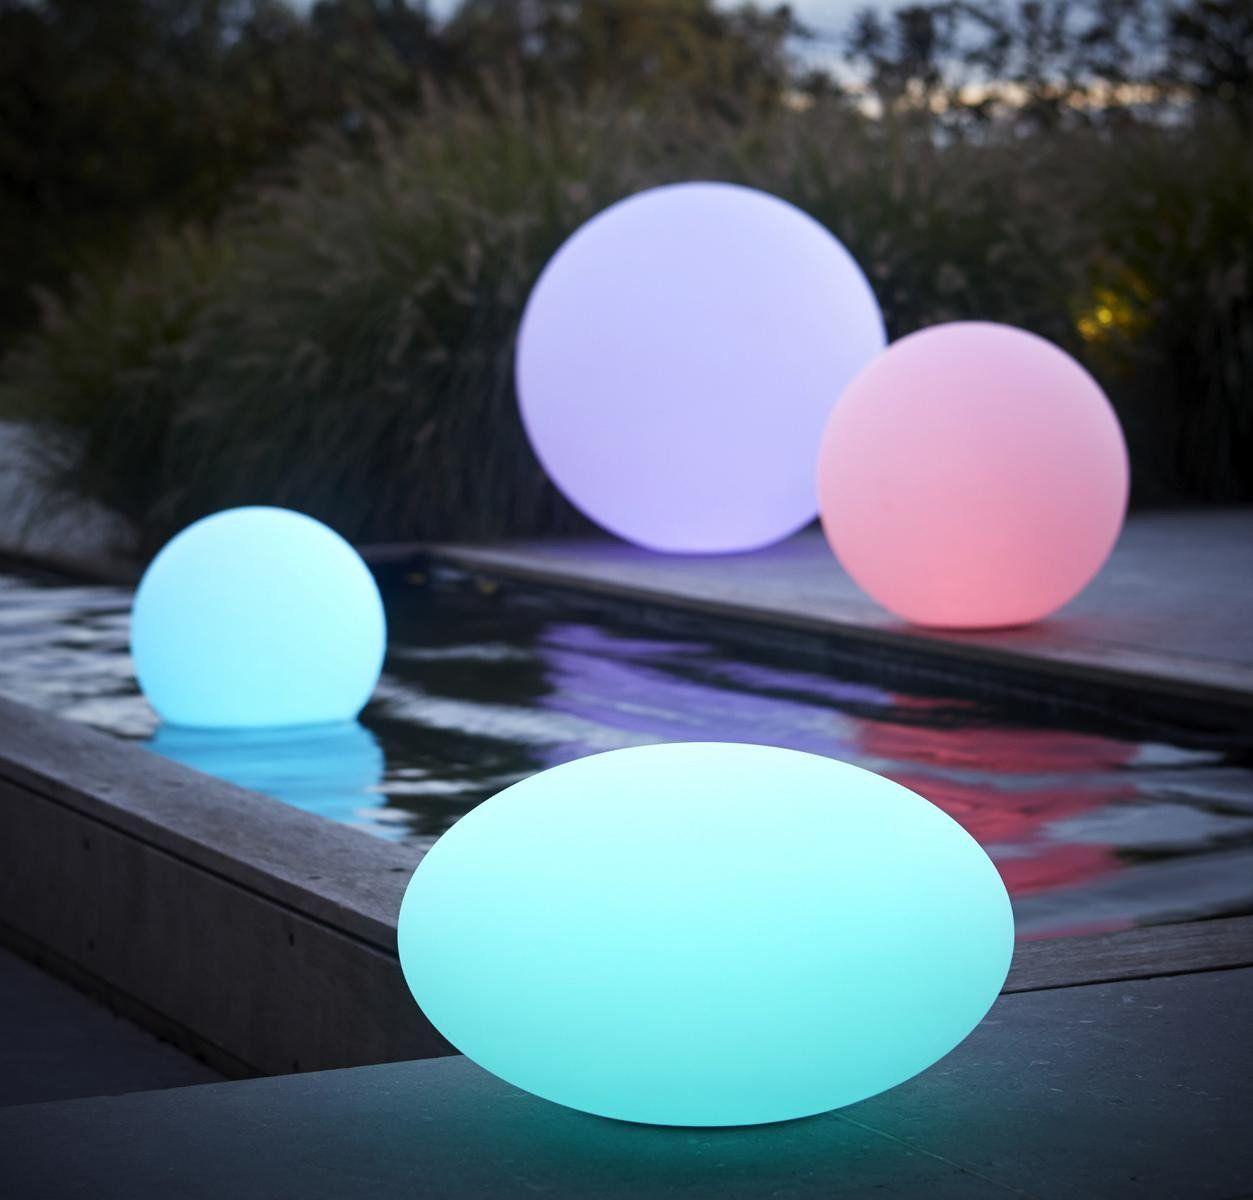 Boule lumineuse led 7 couleurs for Led lumineuse